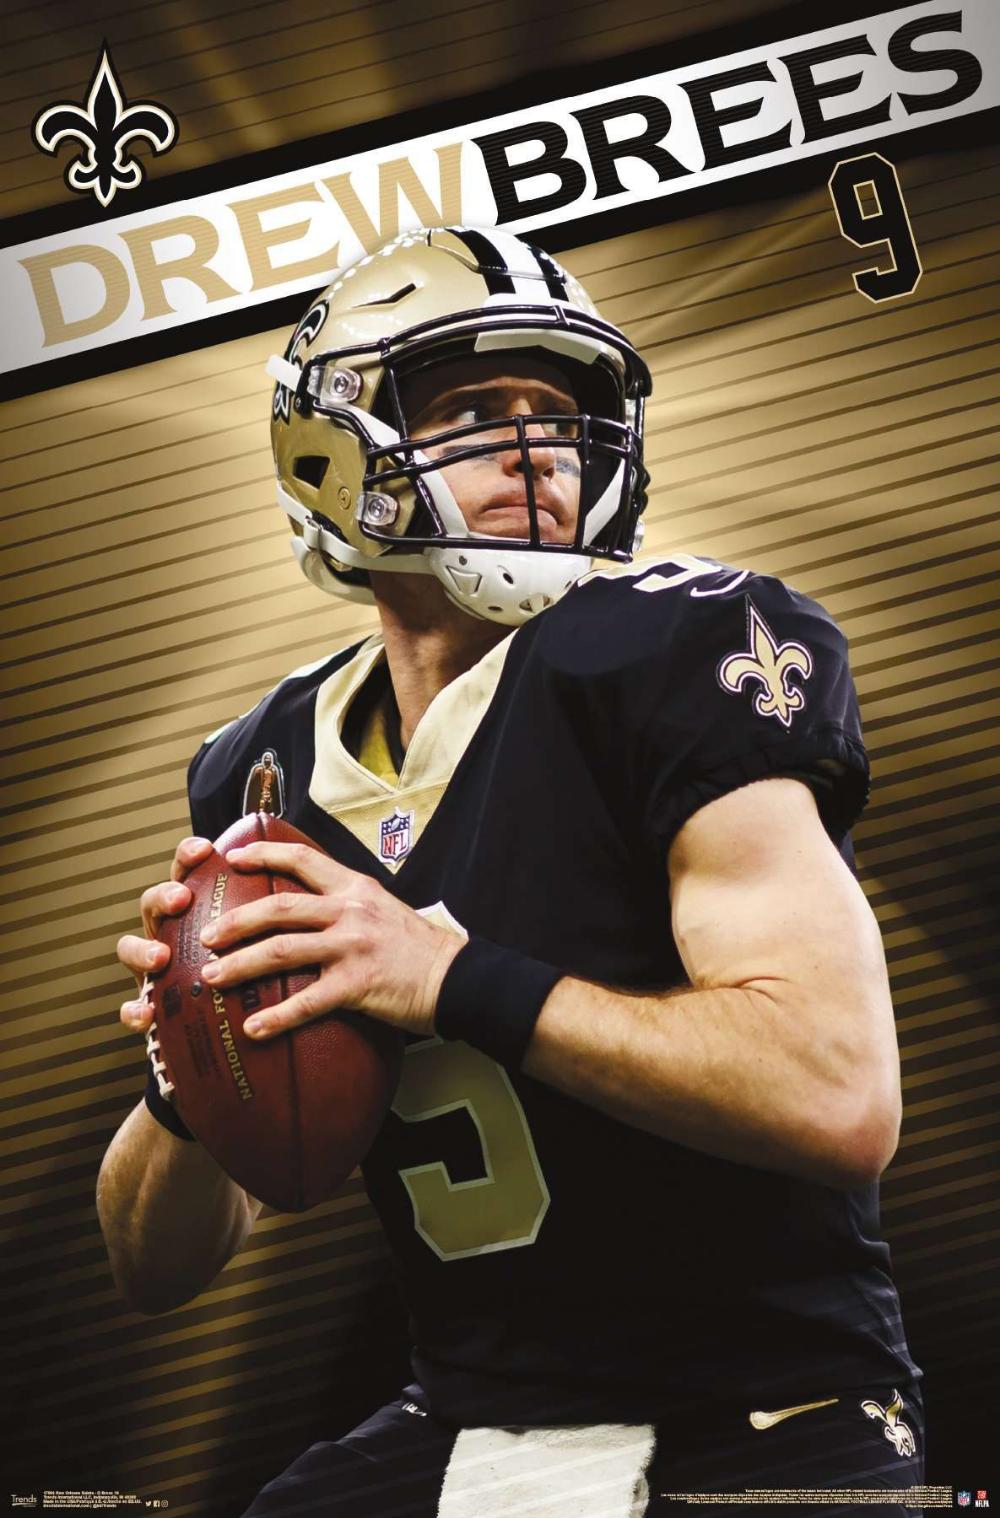 Nfl New Orleans Saints Drew Brees 19 New Orleans Saints New Orleans Saints Football Saints Football